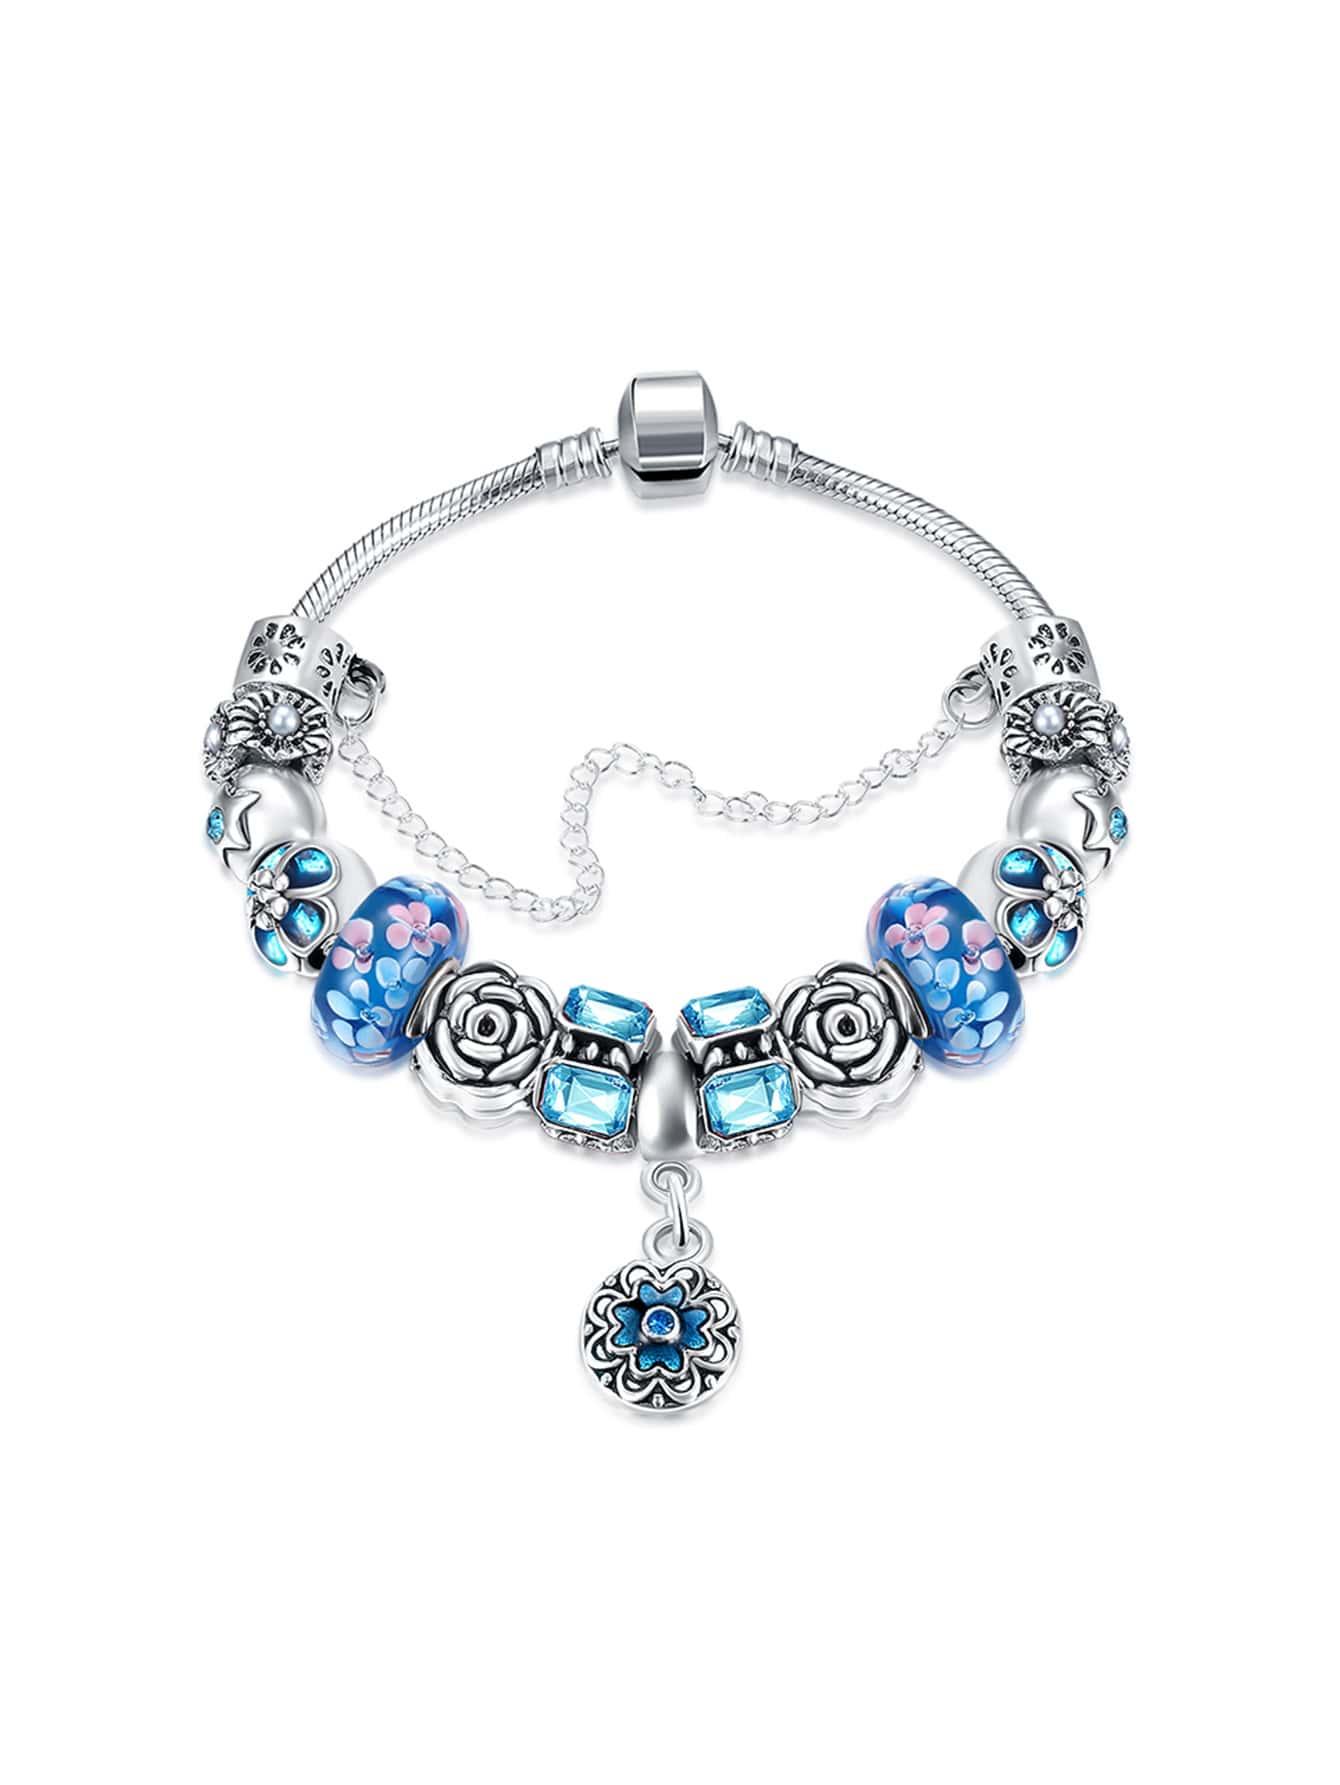 Фото Flower Design Chain Bracelet With Rhinestone. Купить с доставкой